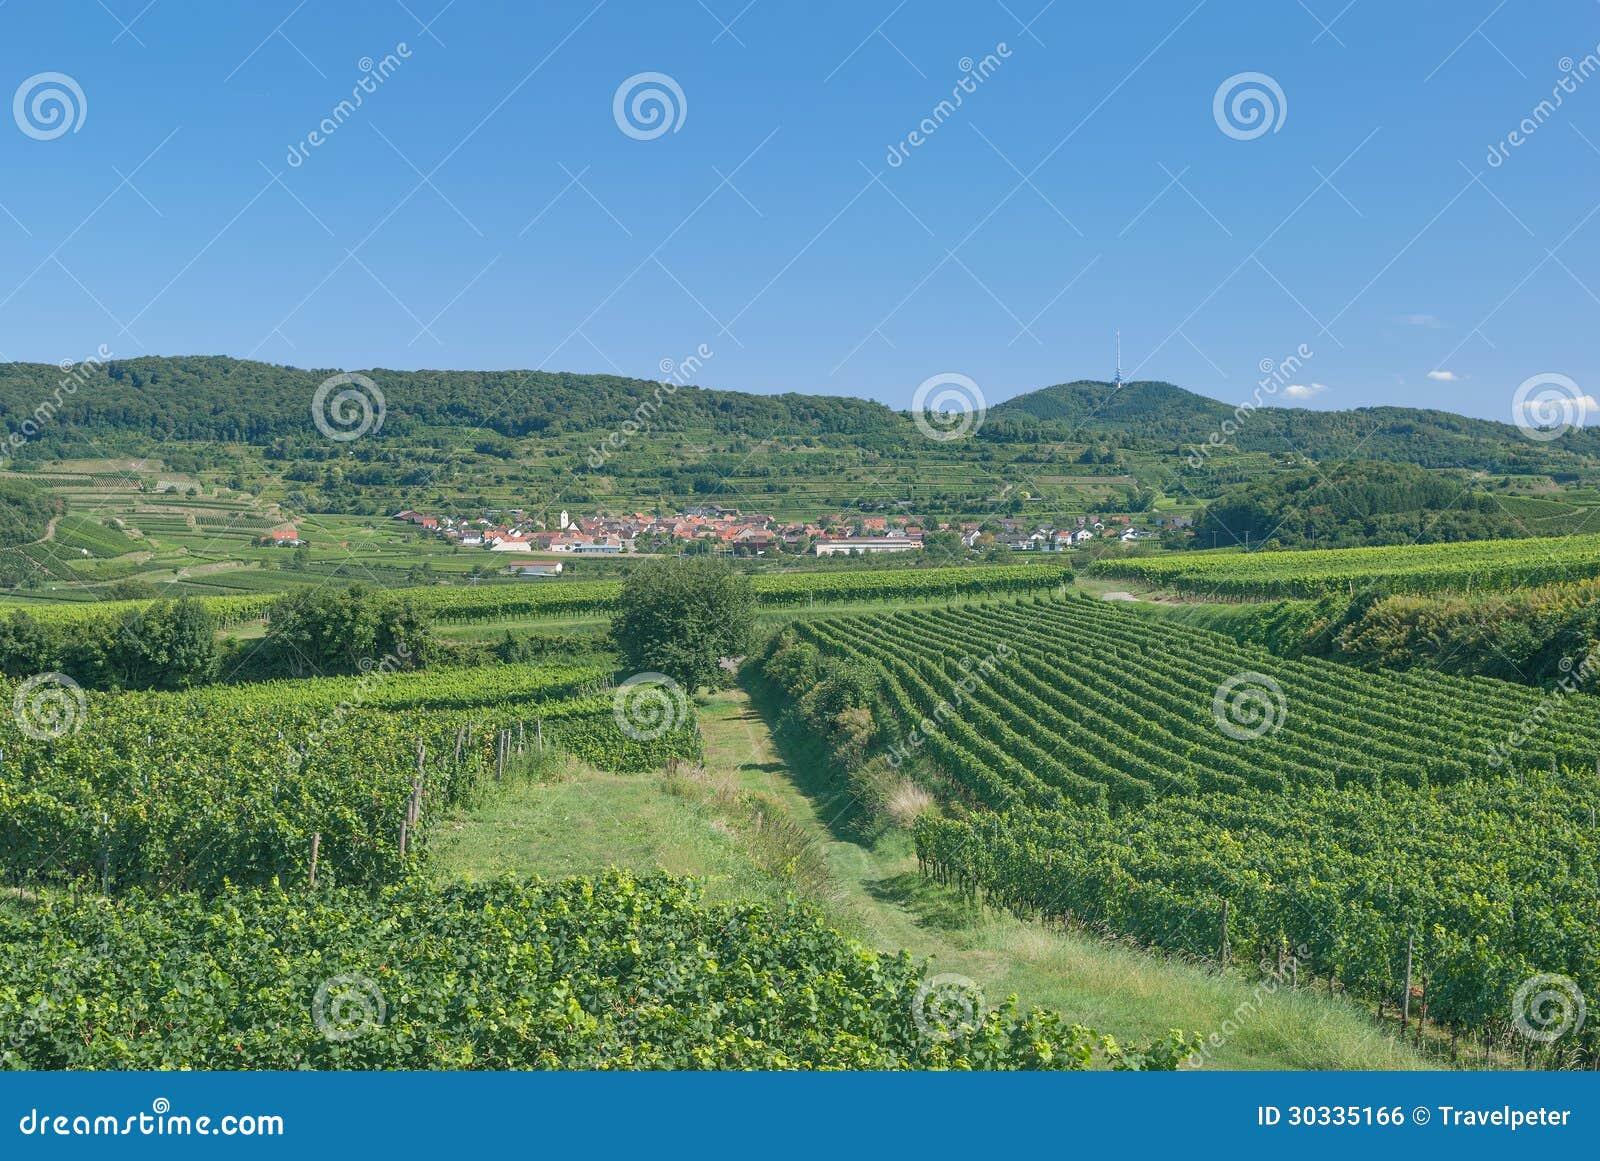 Forest Black Photo Stock Wine Kaiserstuhl Region Germany 0wP8knOX